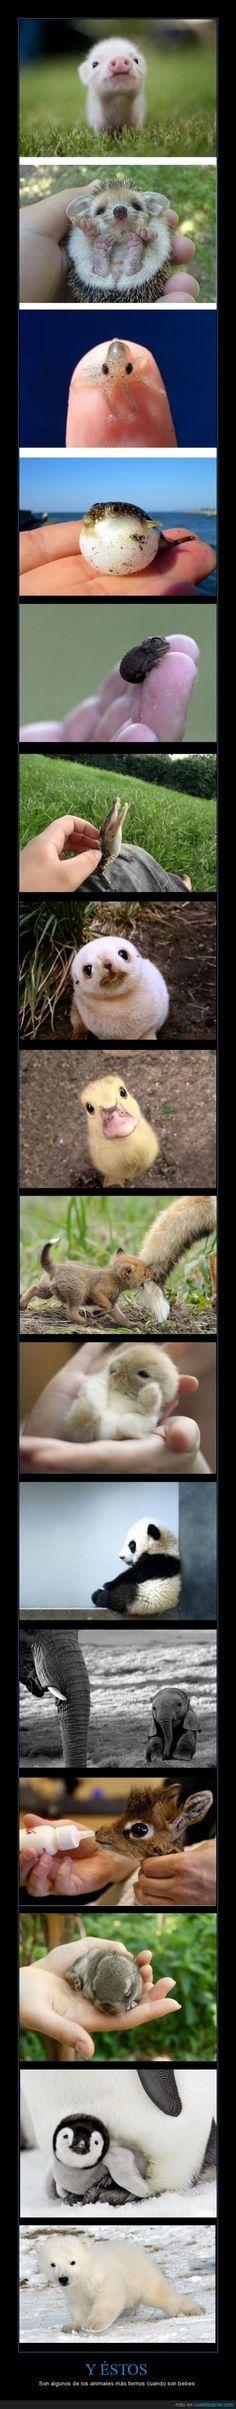 (Ohhh) Baby animals